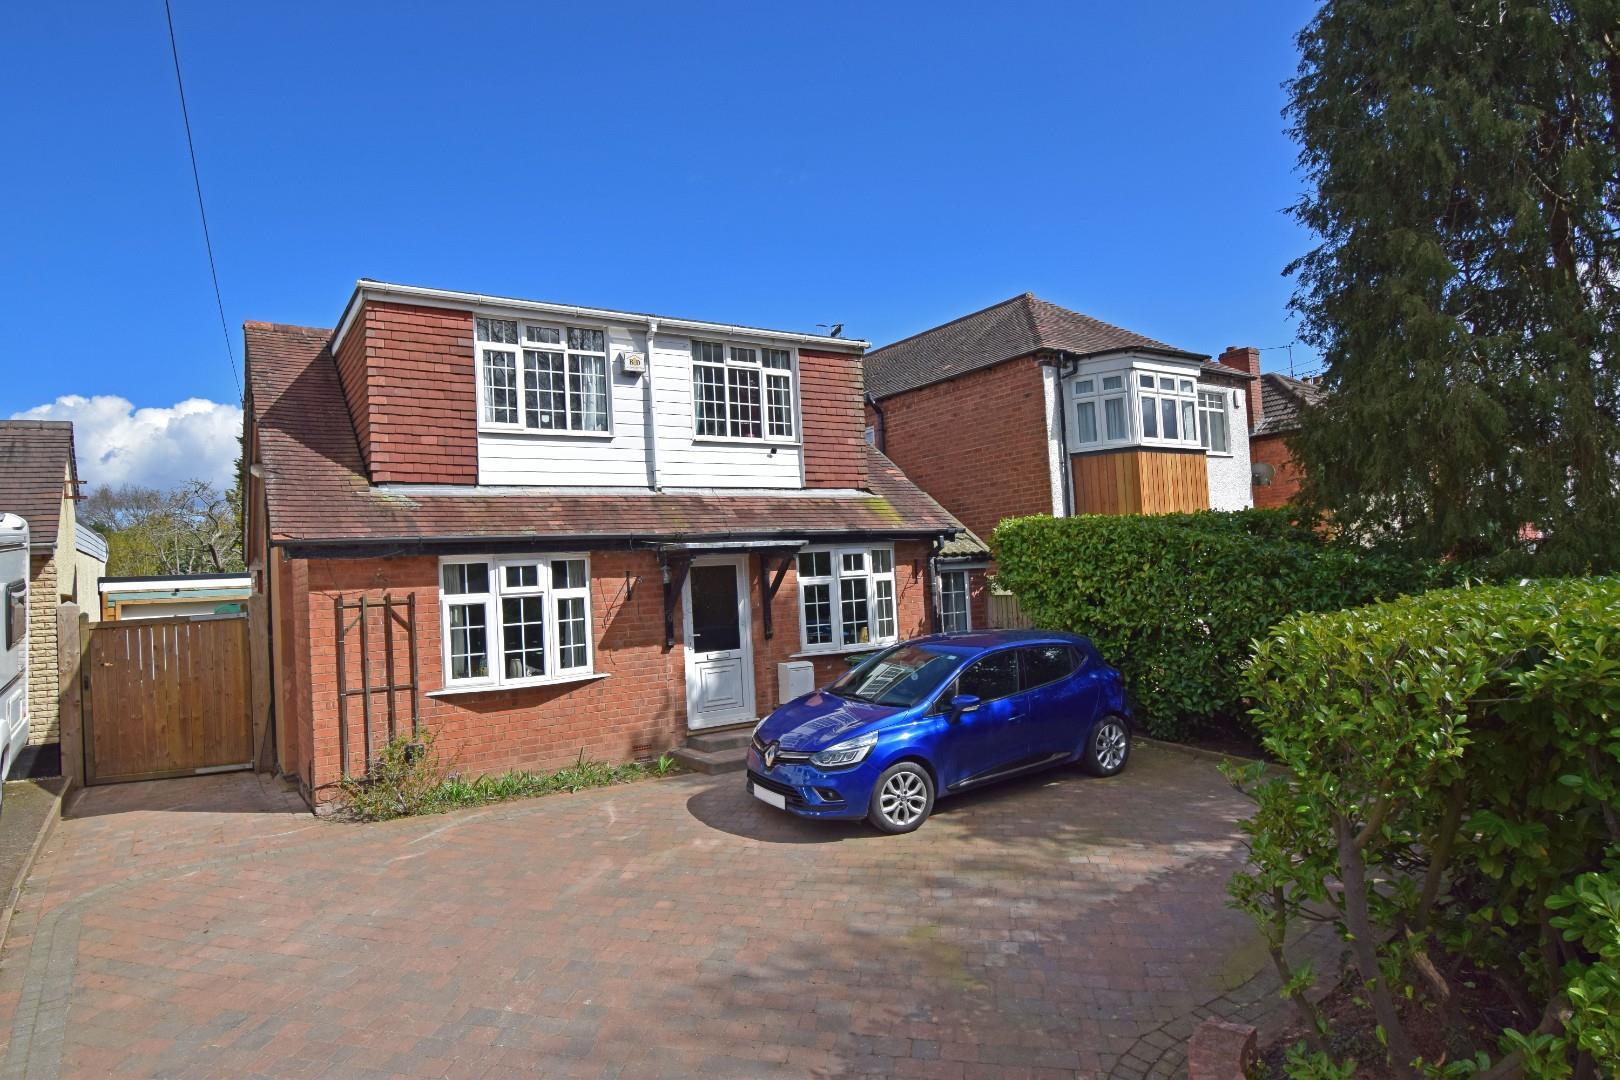 9 Linehouse Lane, Marlbrook, Bromsgrove, Worcestershire, B60 1HR